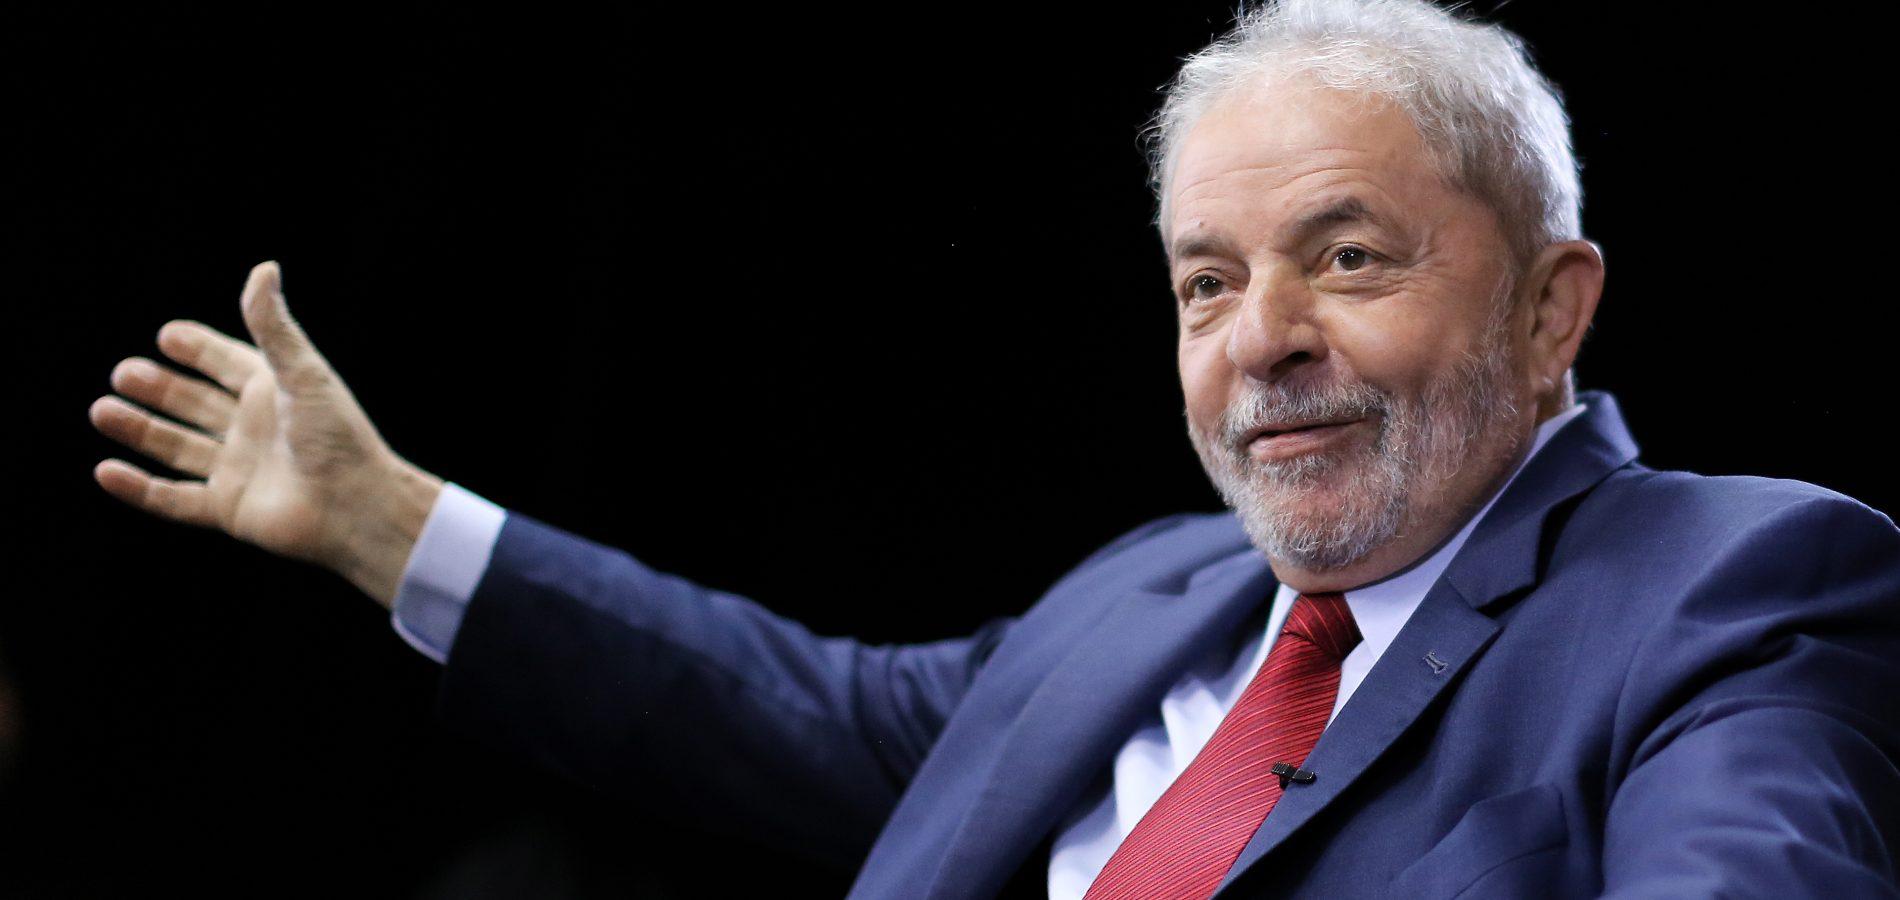 Lula lidera corrida para 2018, mas perderia no 2º turno